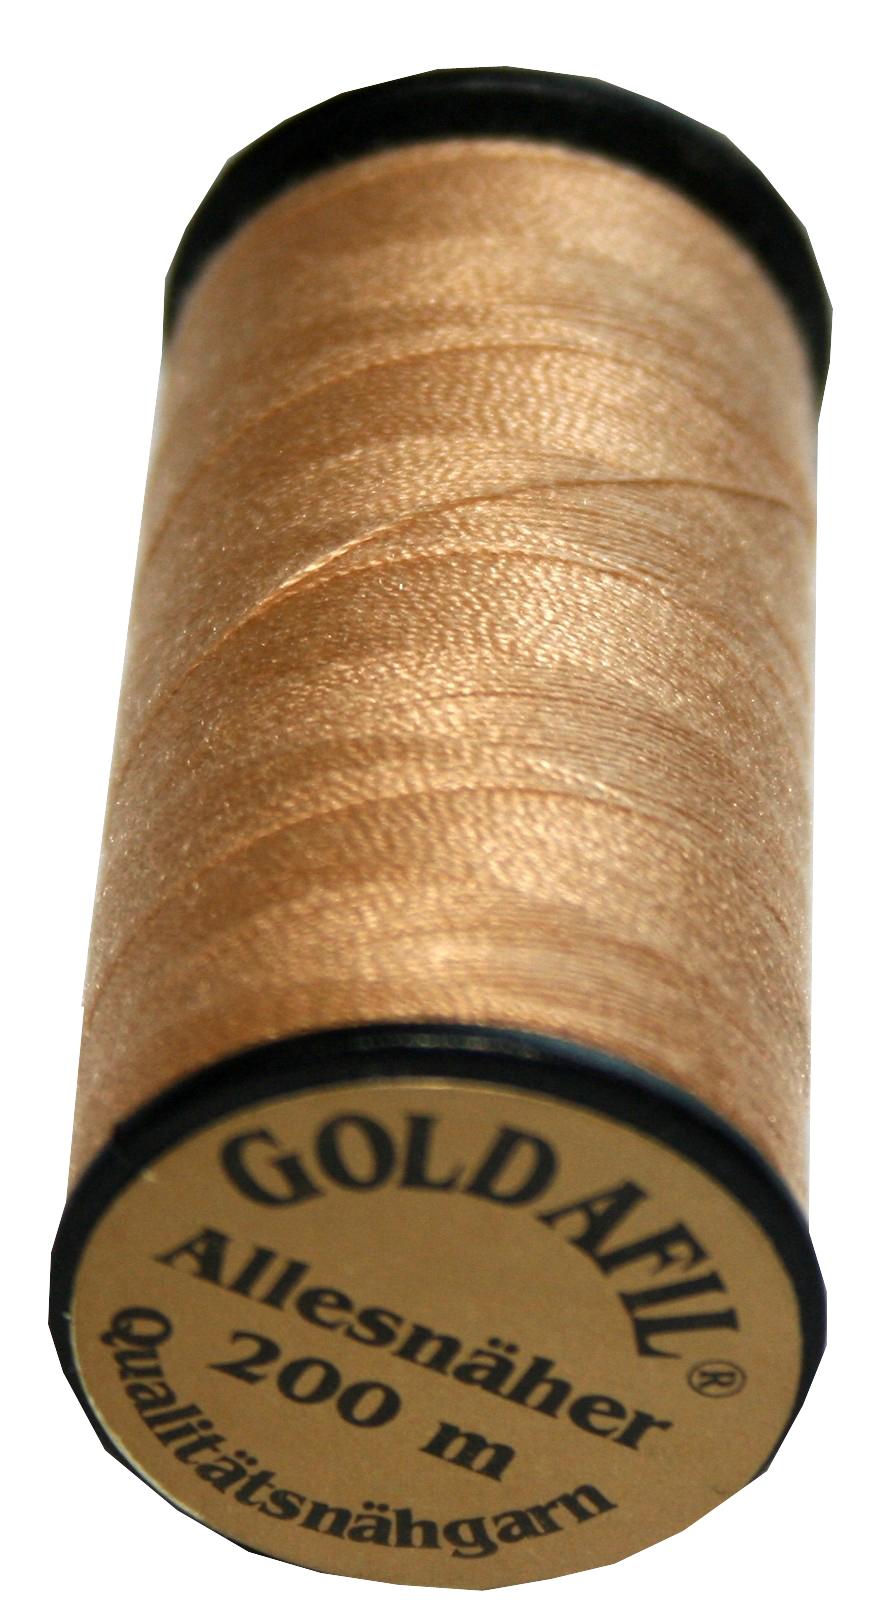 Nähmaschinen Nähgarn Polyester Ne 40/2 beige braun 200 m (1036)